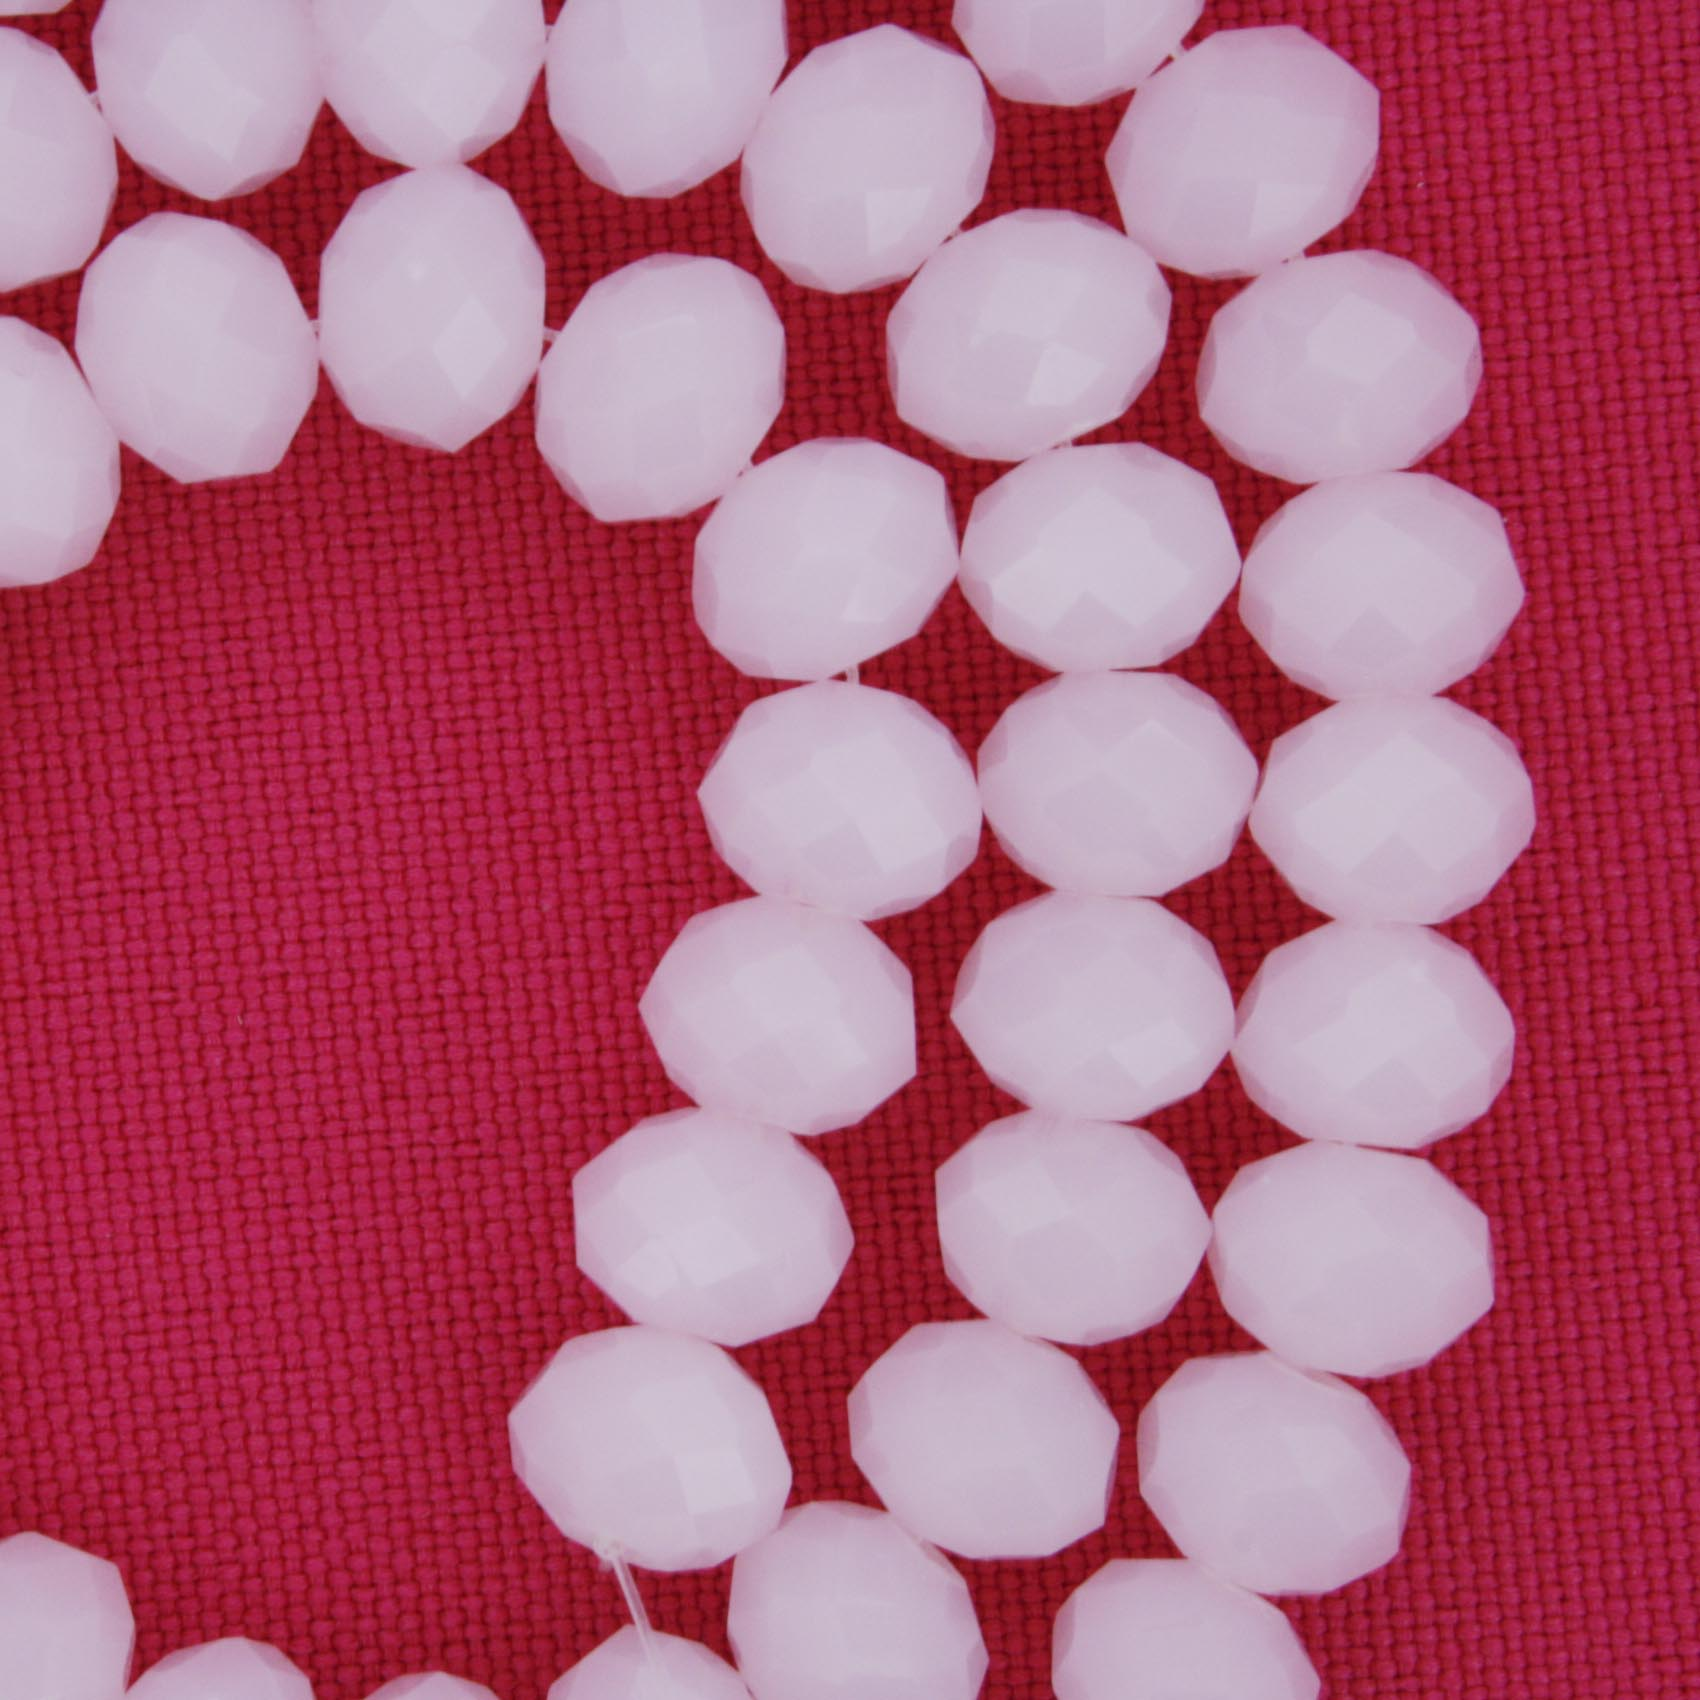 Fio de Cristal - Flat® - Rosa - 8mm  - Stéphanie Bijoux® - Peças para Bijuterias e Artesanato